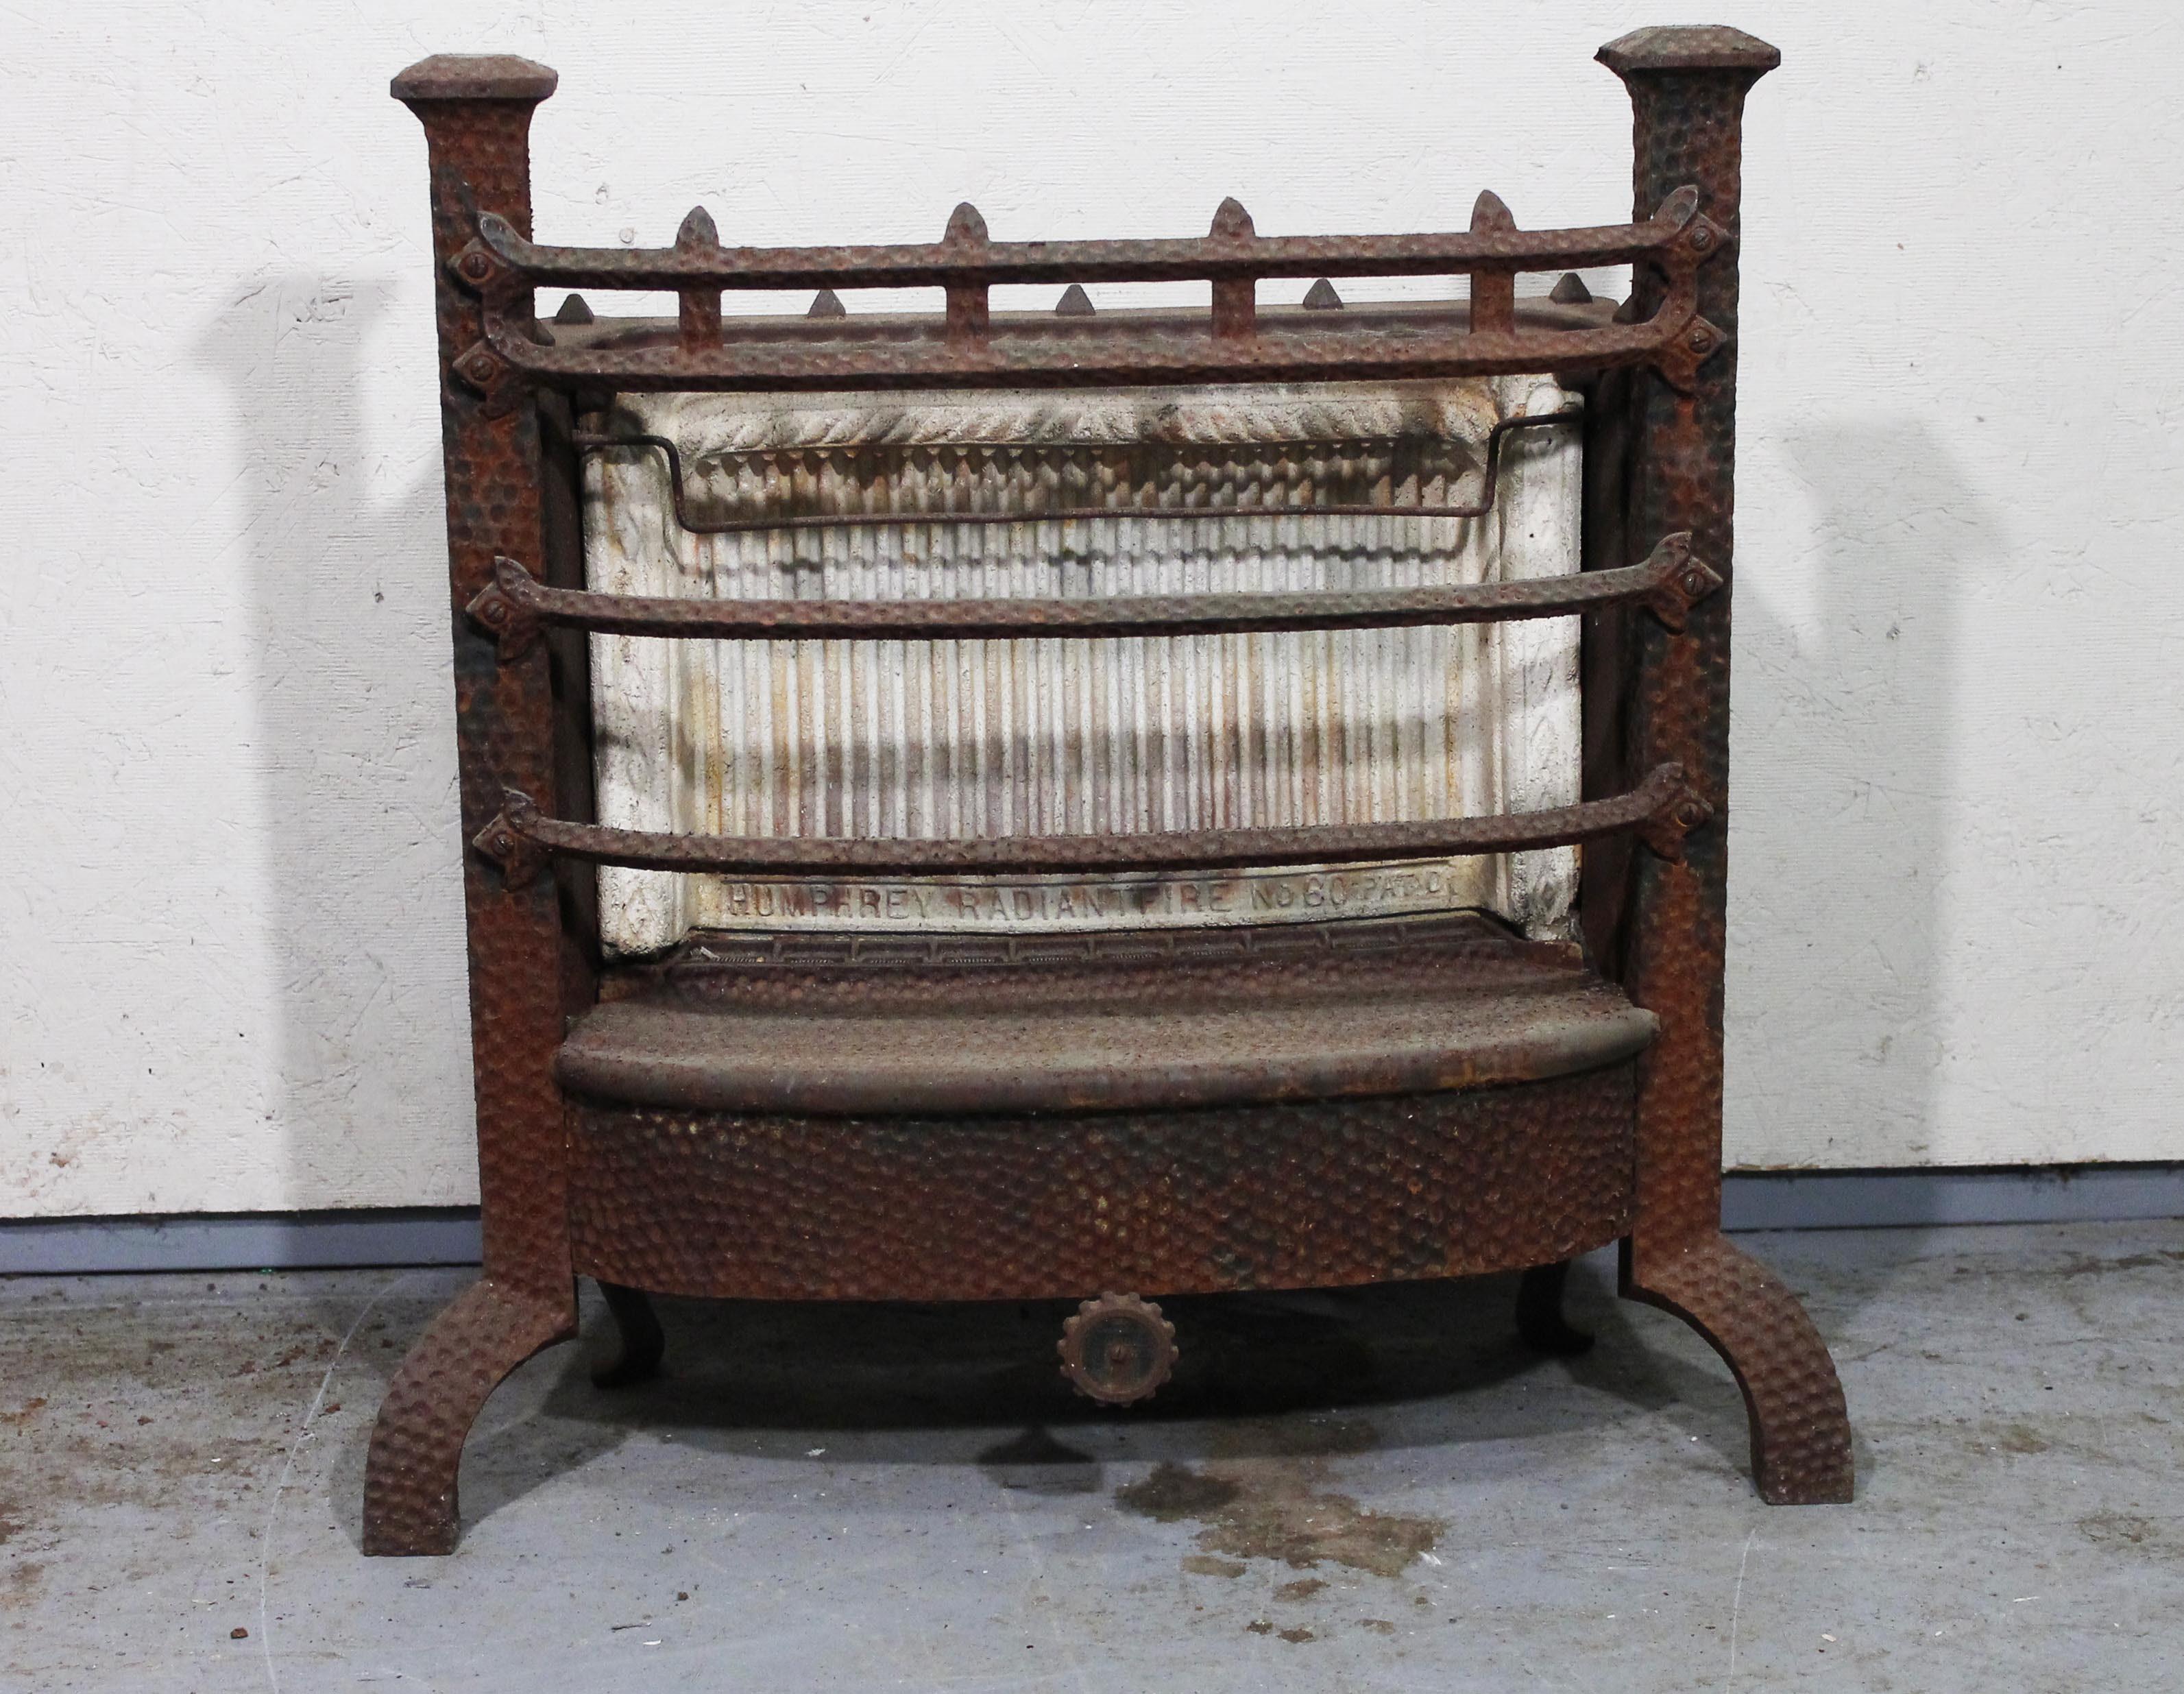 antique gas fireplace insert by humphrey radiant fire ebth